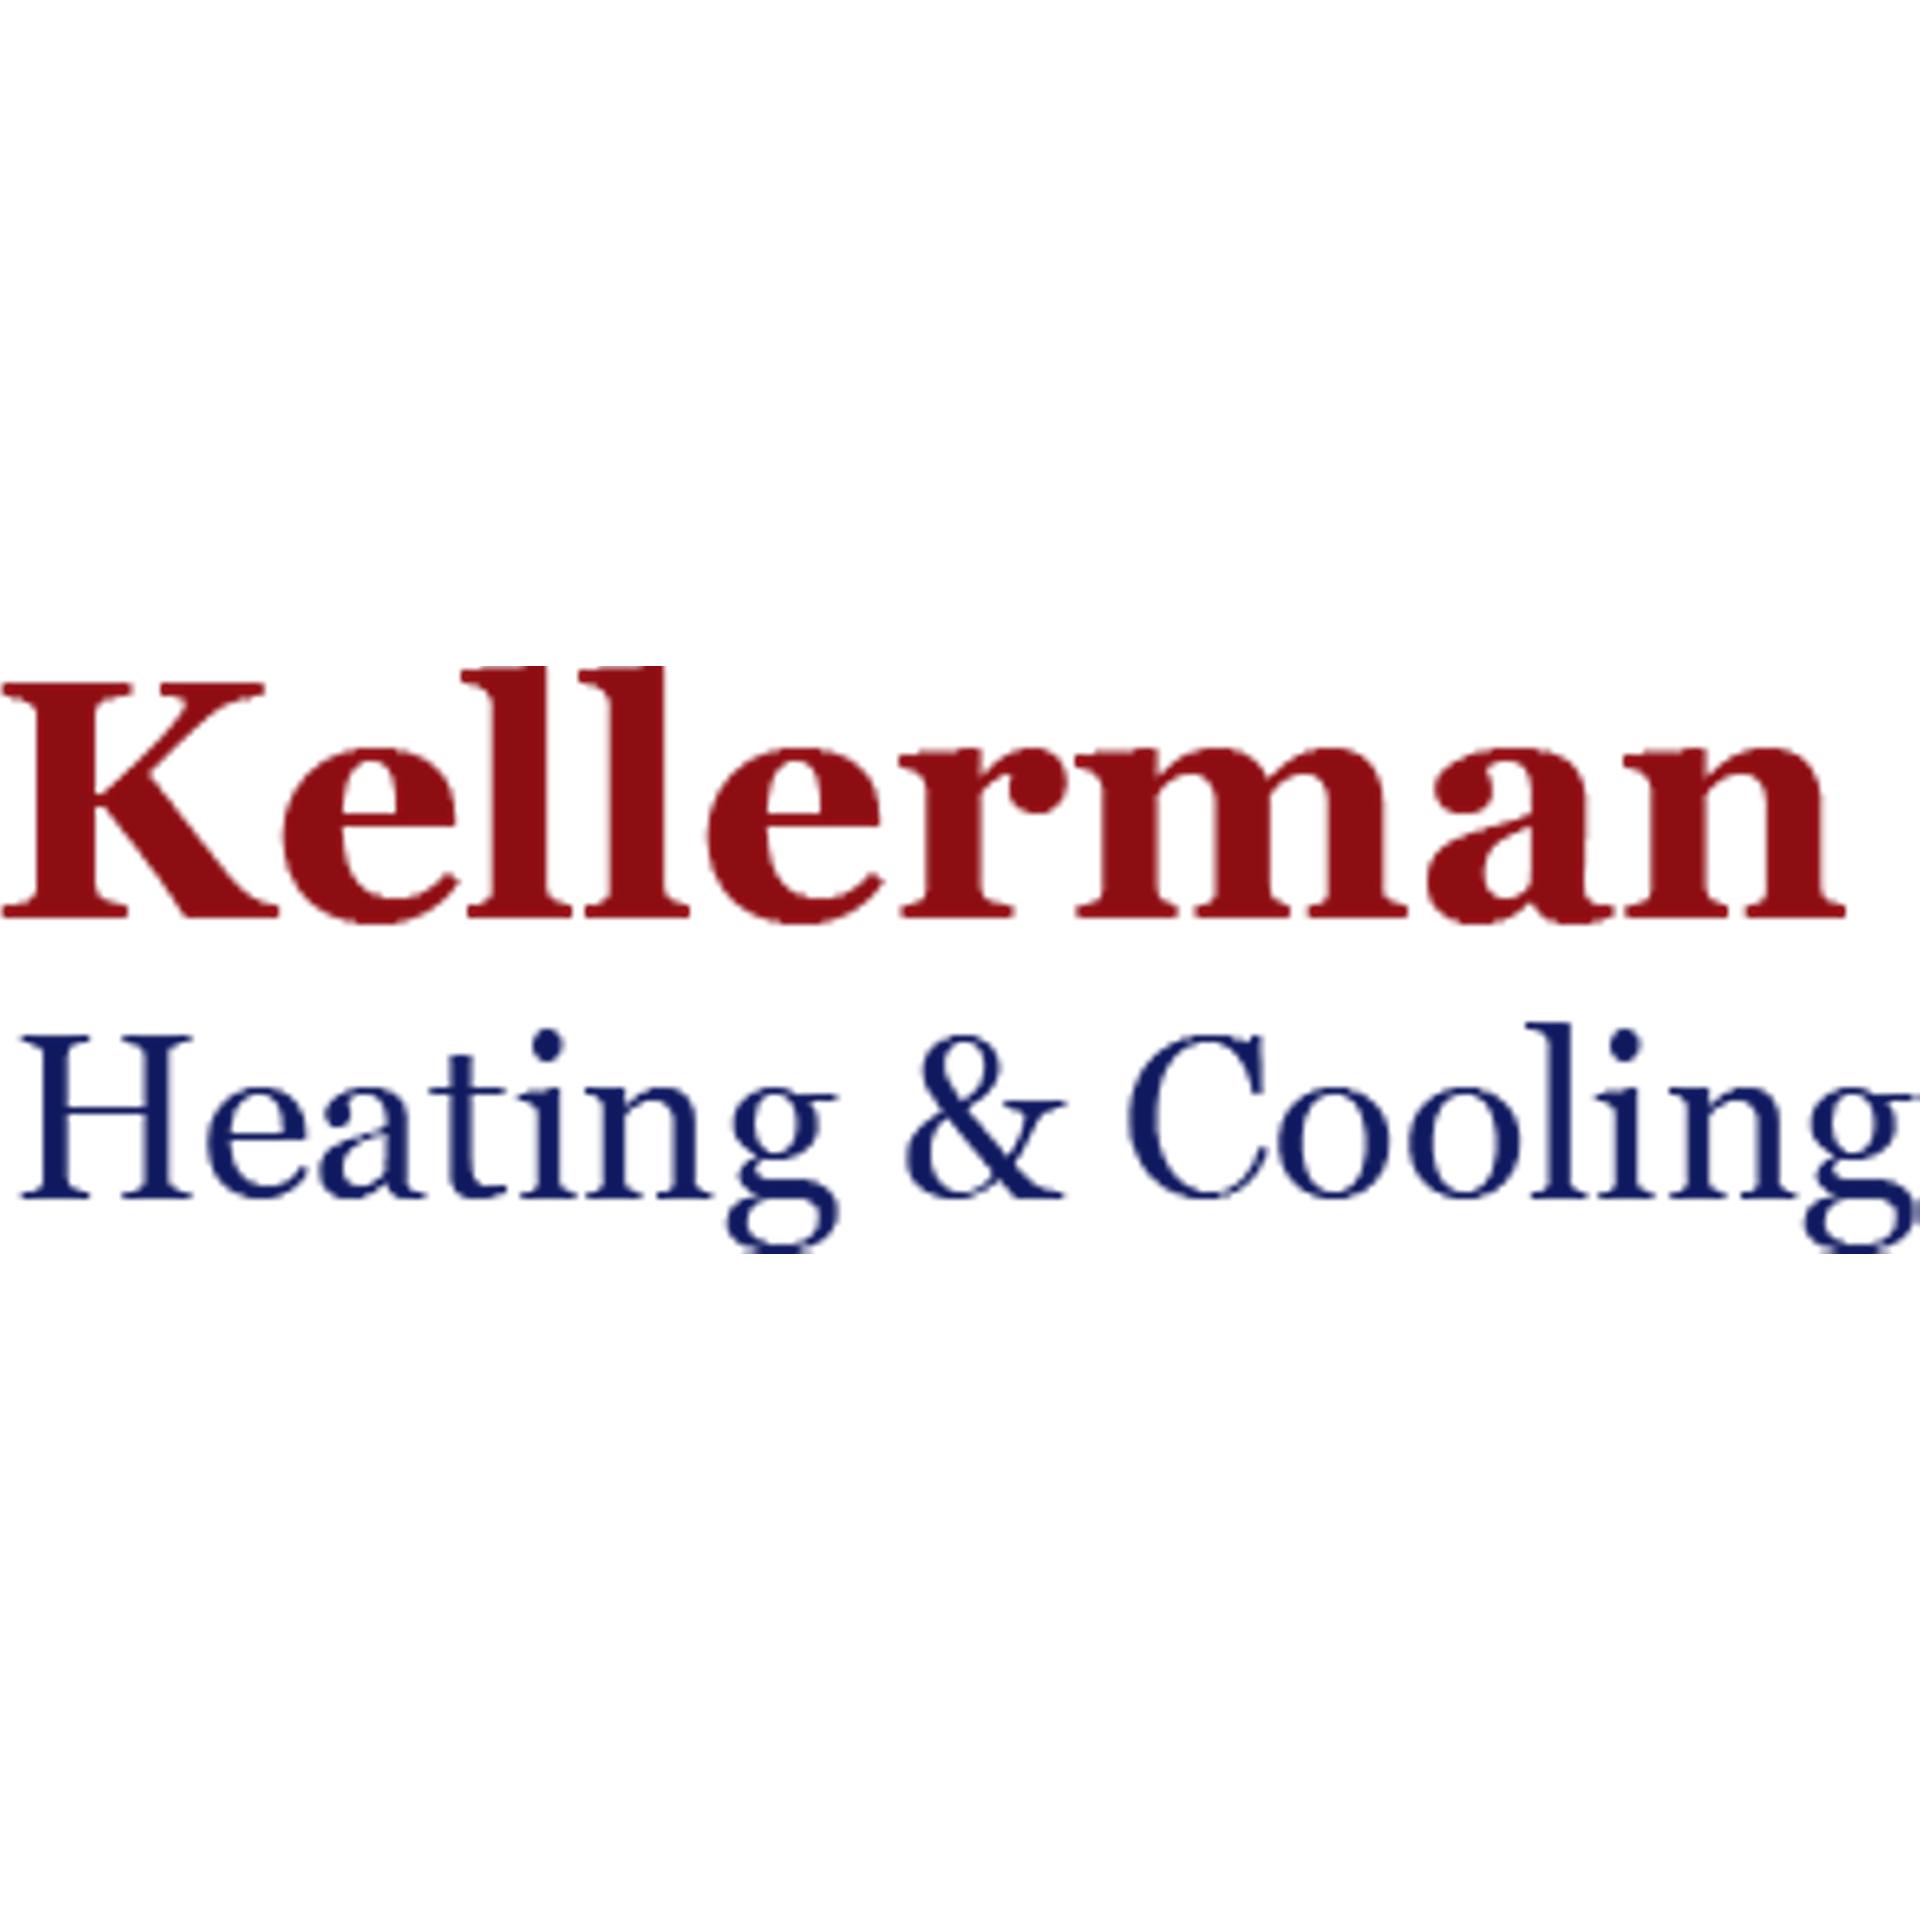 Kellerman Heating & Cooling - Amelia, OH - Heating & Air Conditioning